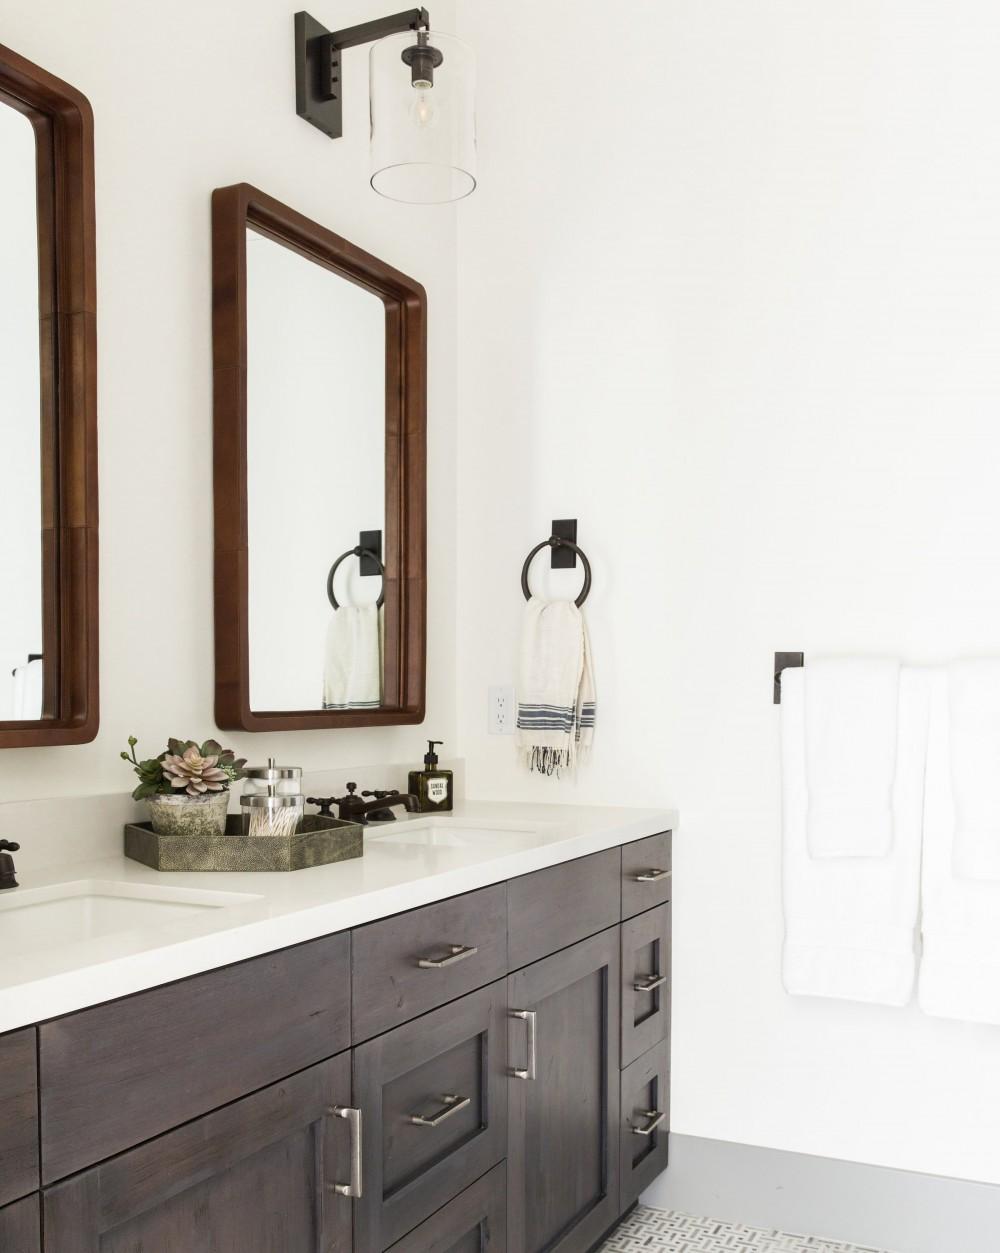 Ultimate Bathroom Decorative Mirrors Guide (2020 Ver.)